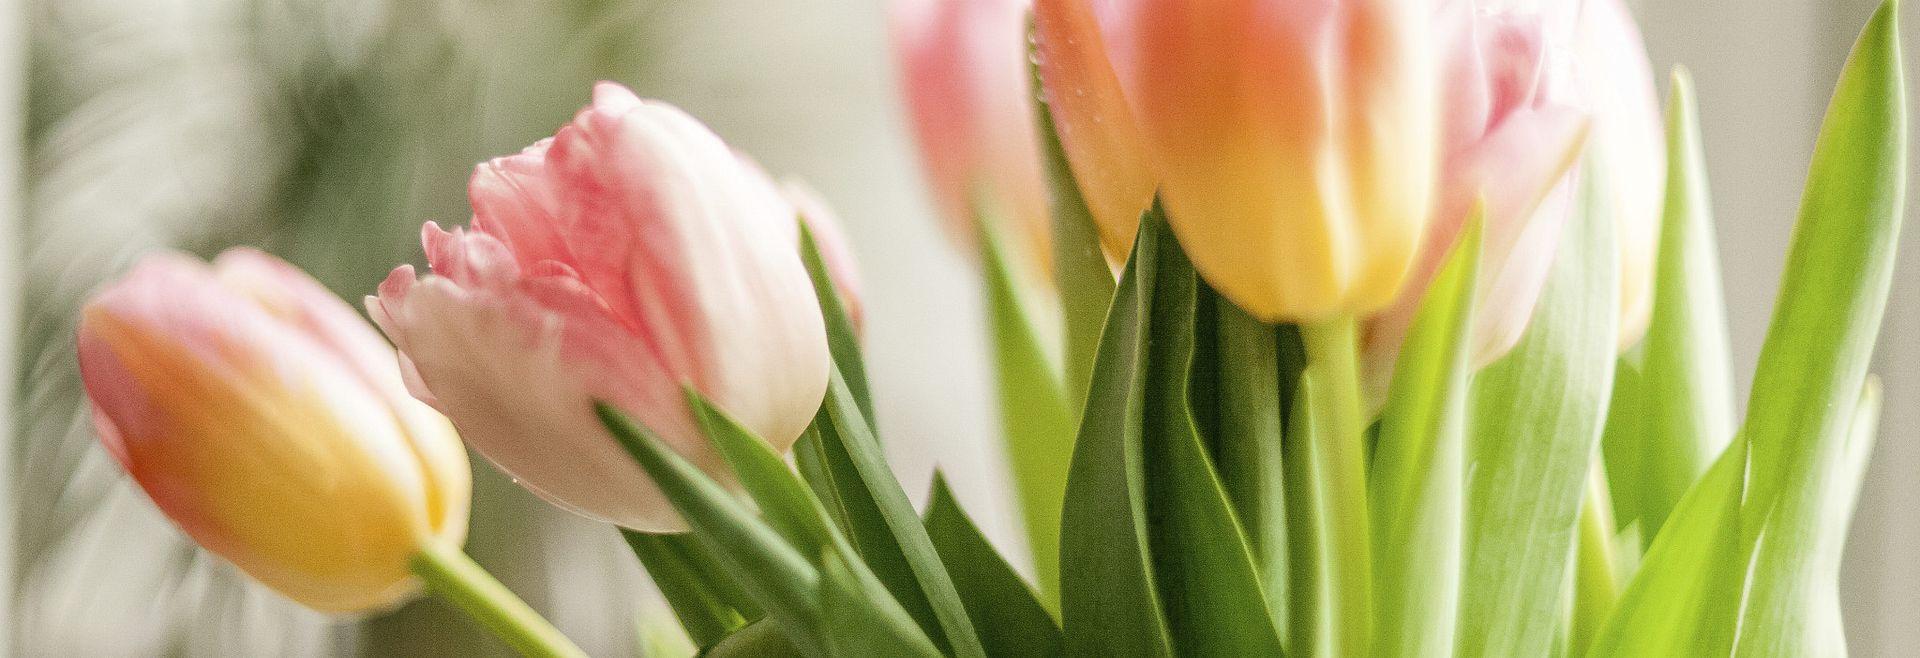 Tulips Roses